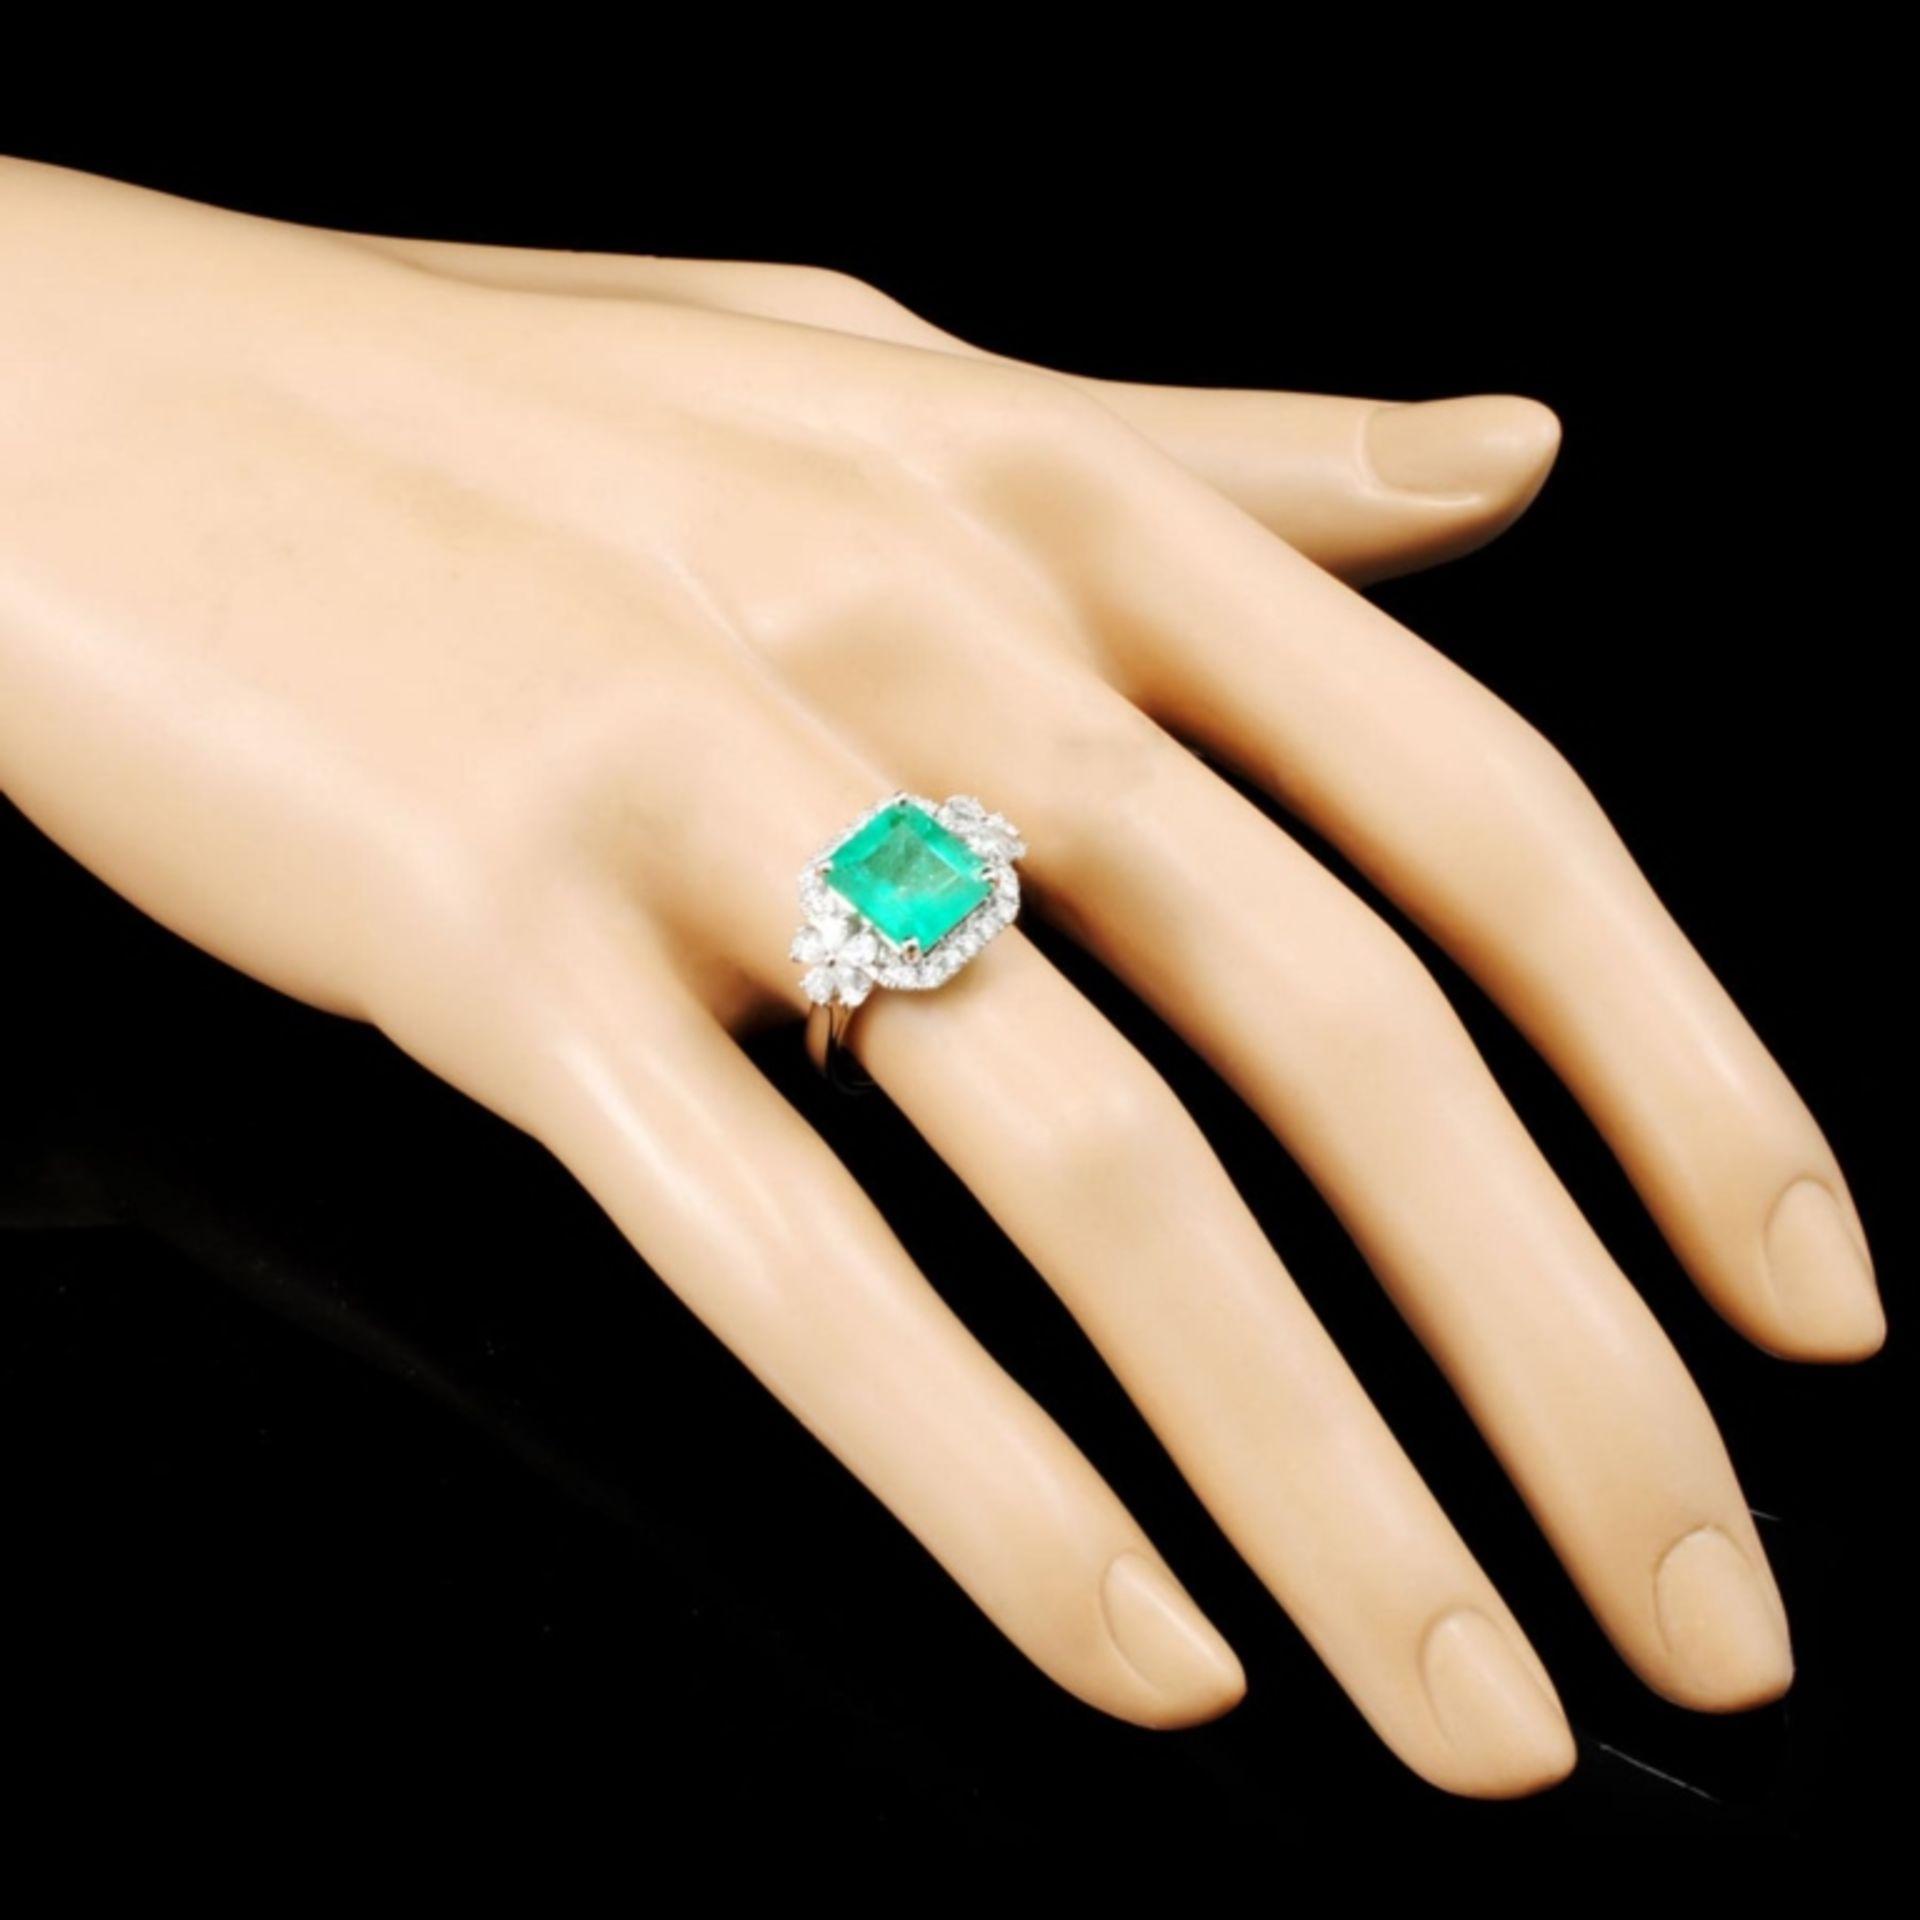 18K Gold 2.60ct Emerald & 0.77ctw Diamond Ring - Image 3 of 5